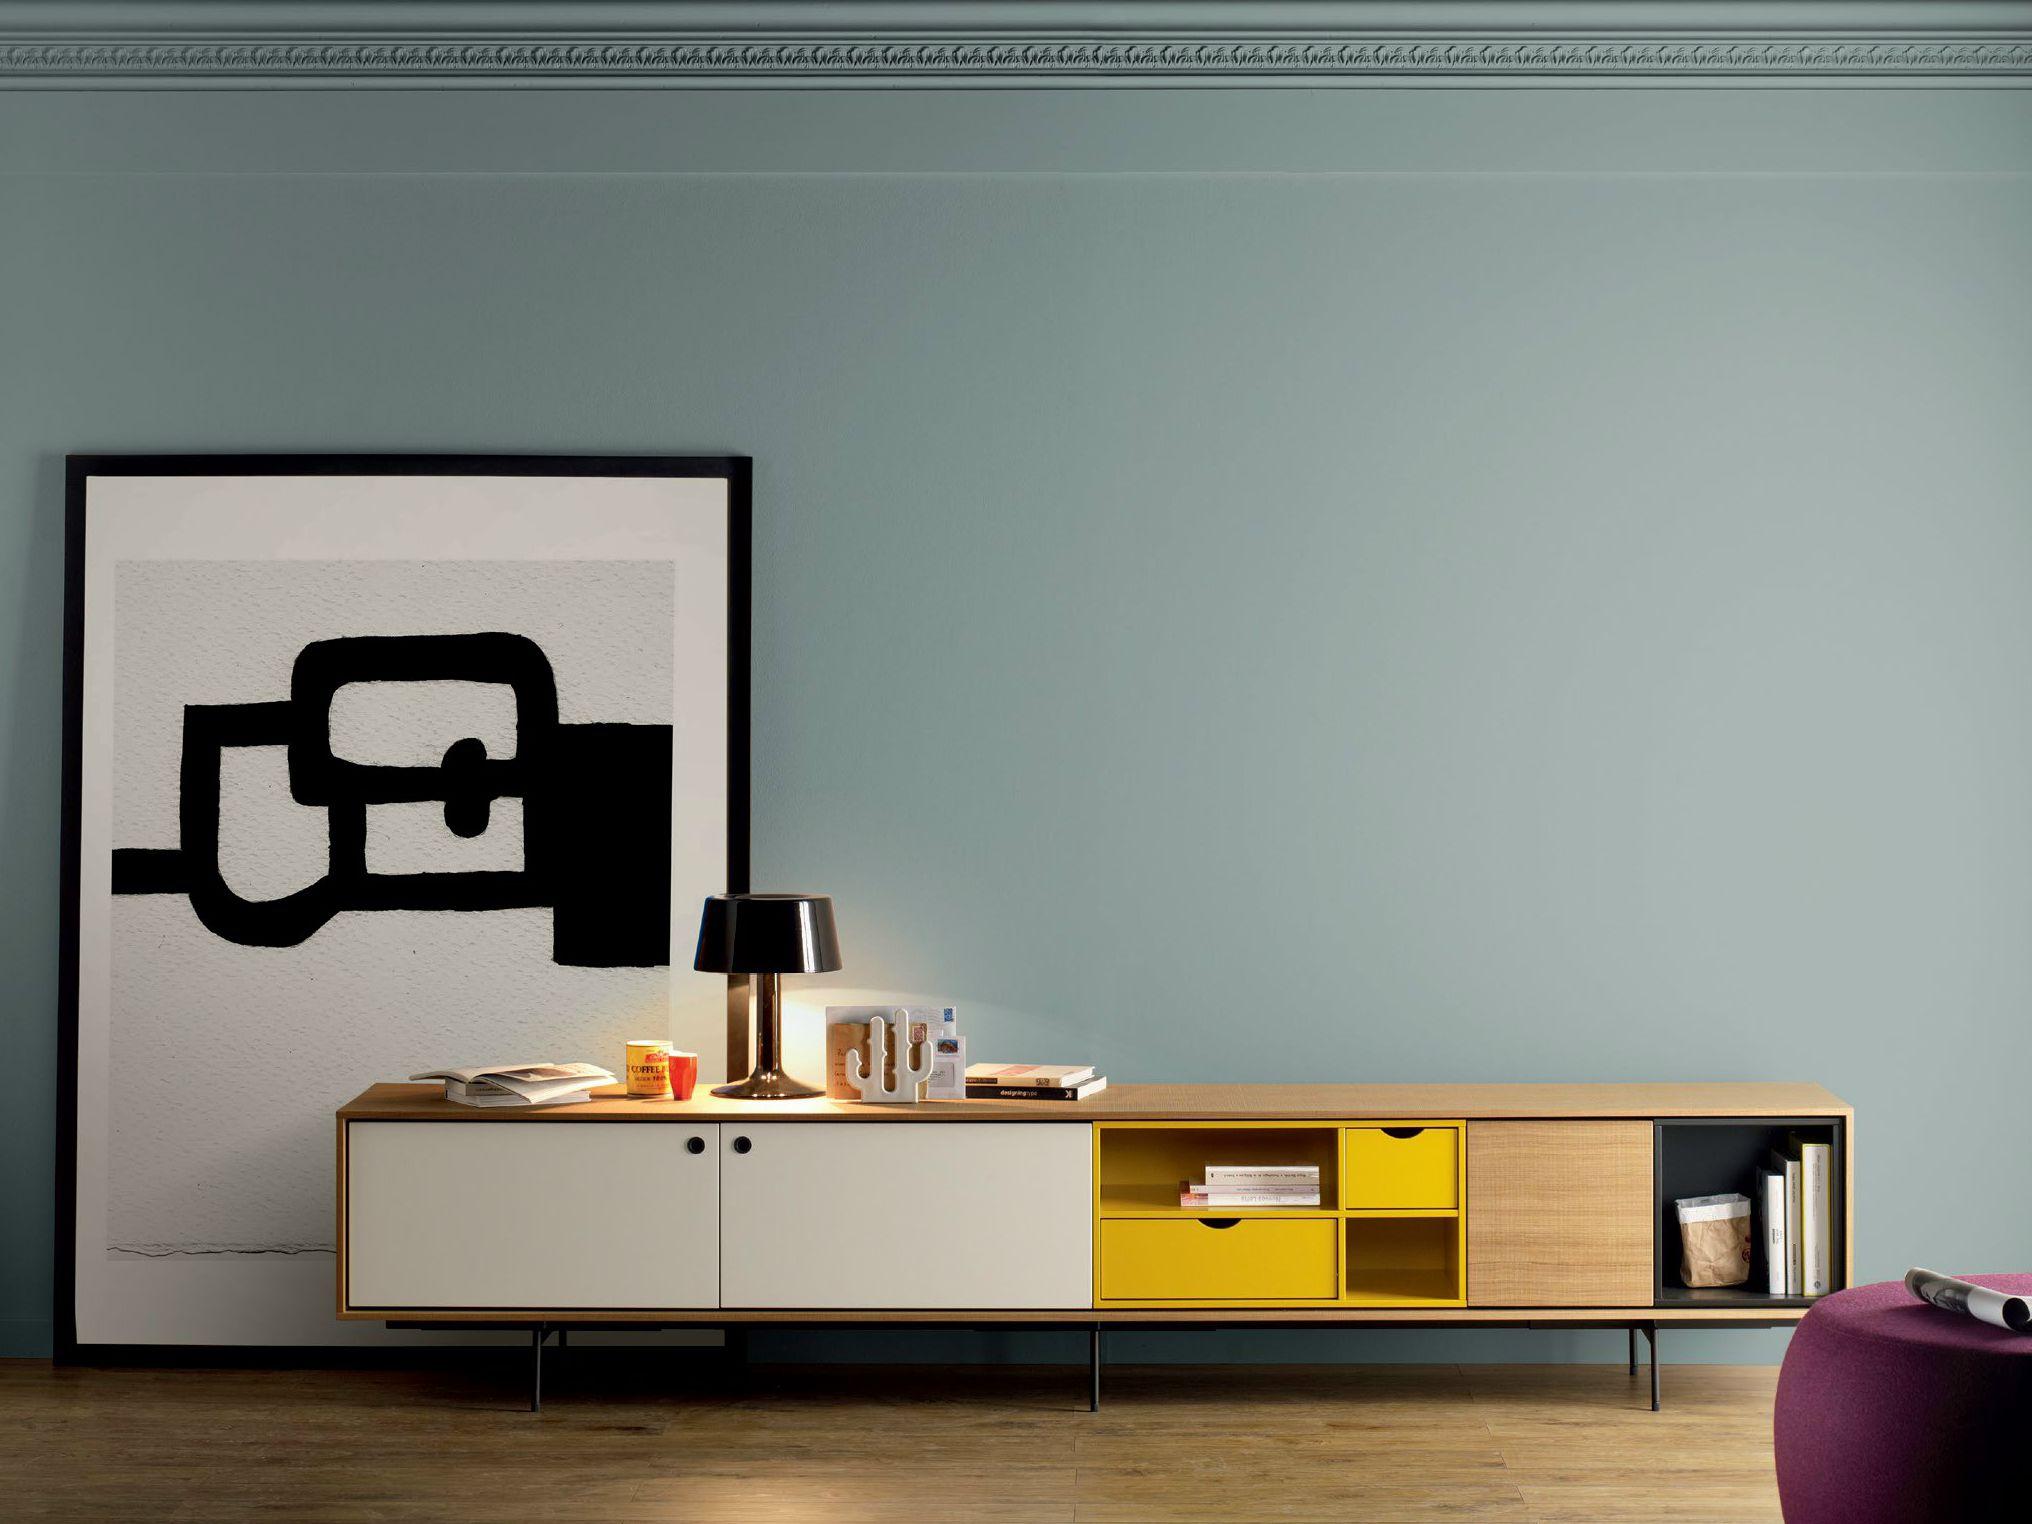 Contemporary style wooden sideboard aura c9 aura for Empresa vasca muebles baratos